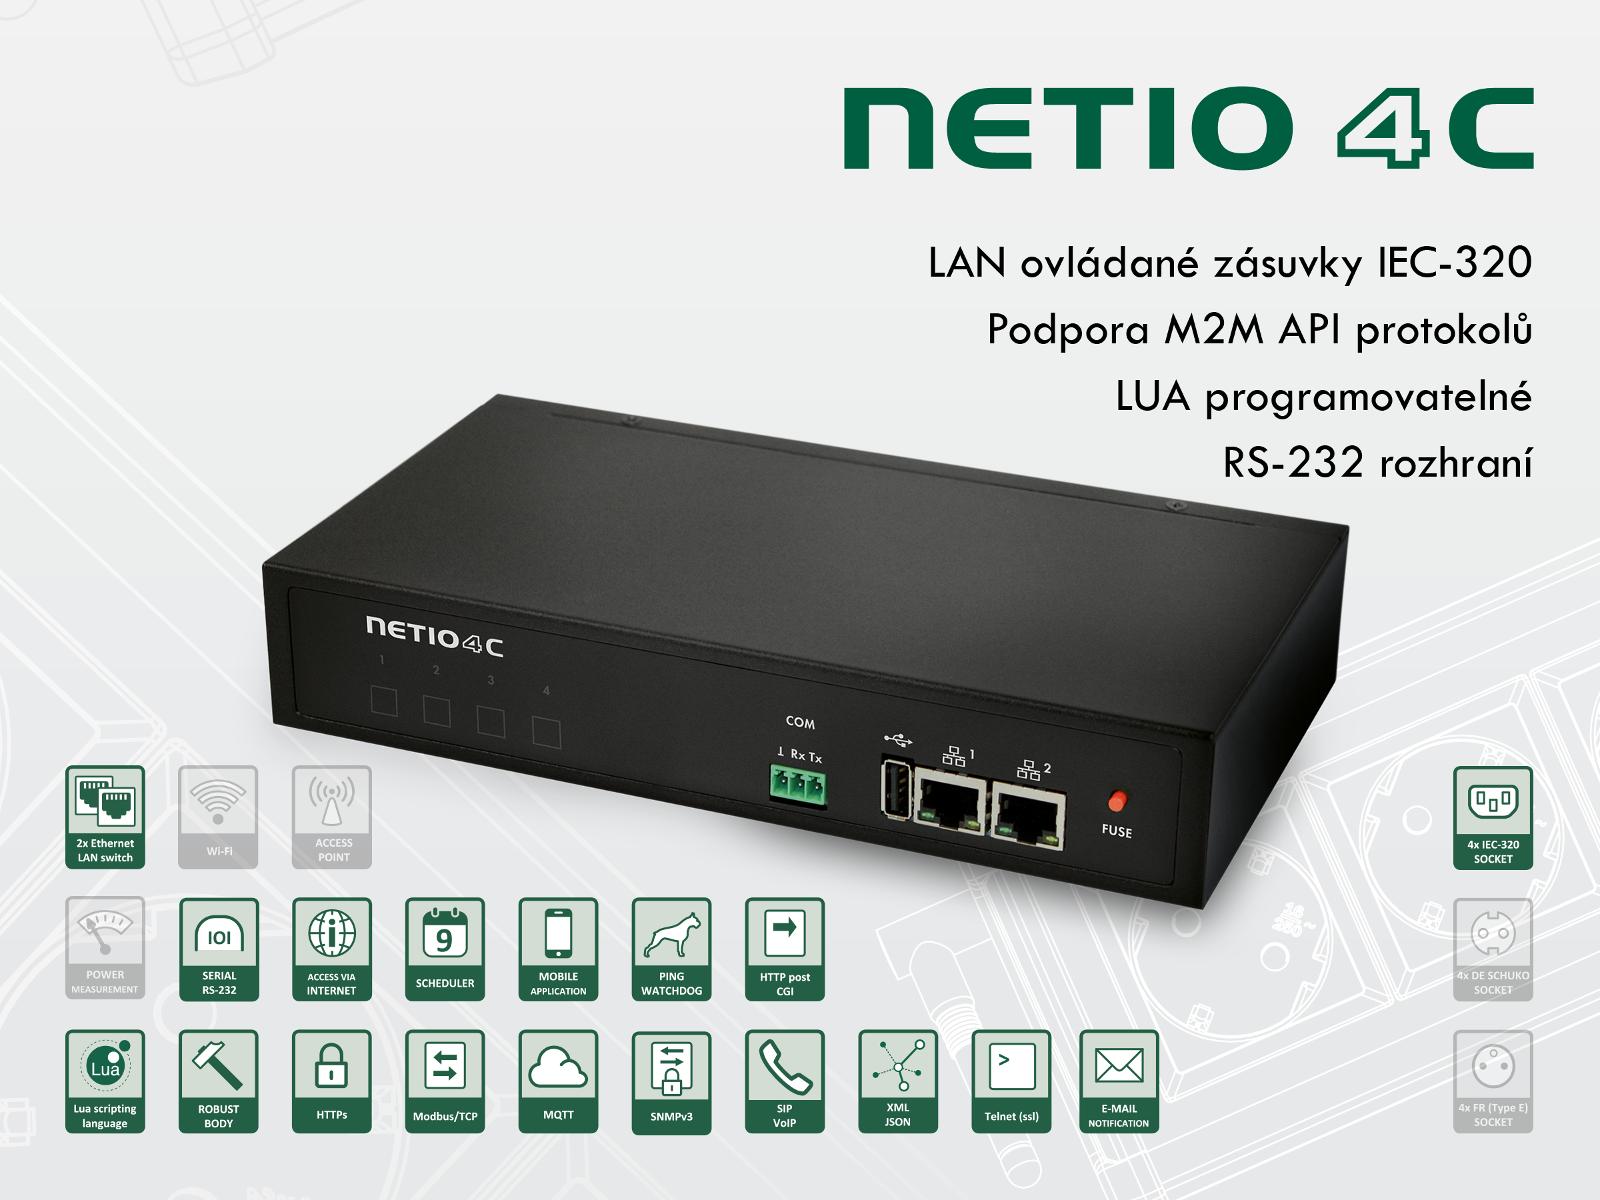 Chytré PDU NETIO 4C s podporou modbus, tcp a telnet